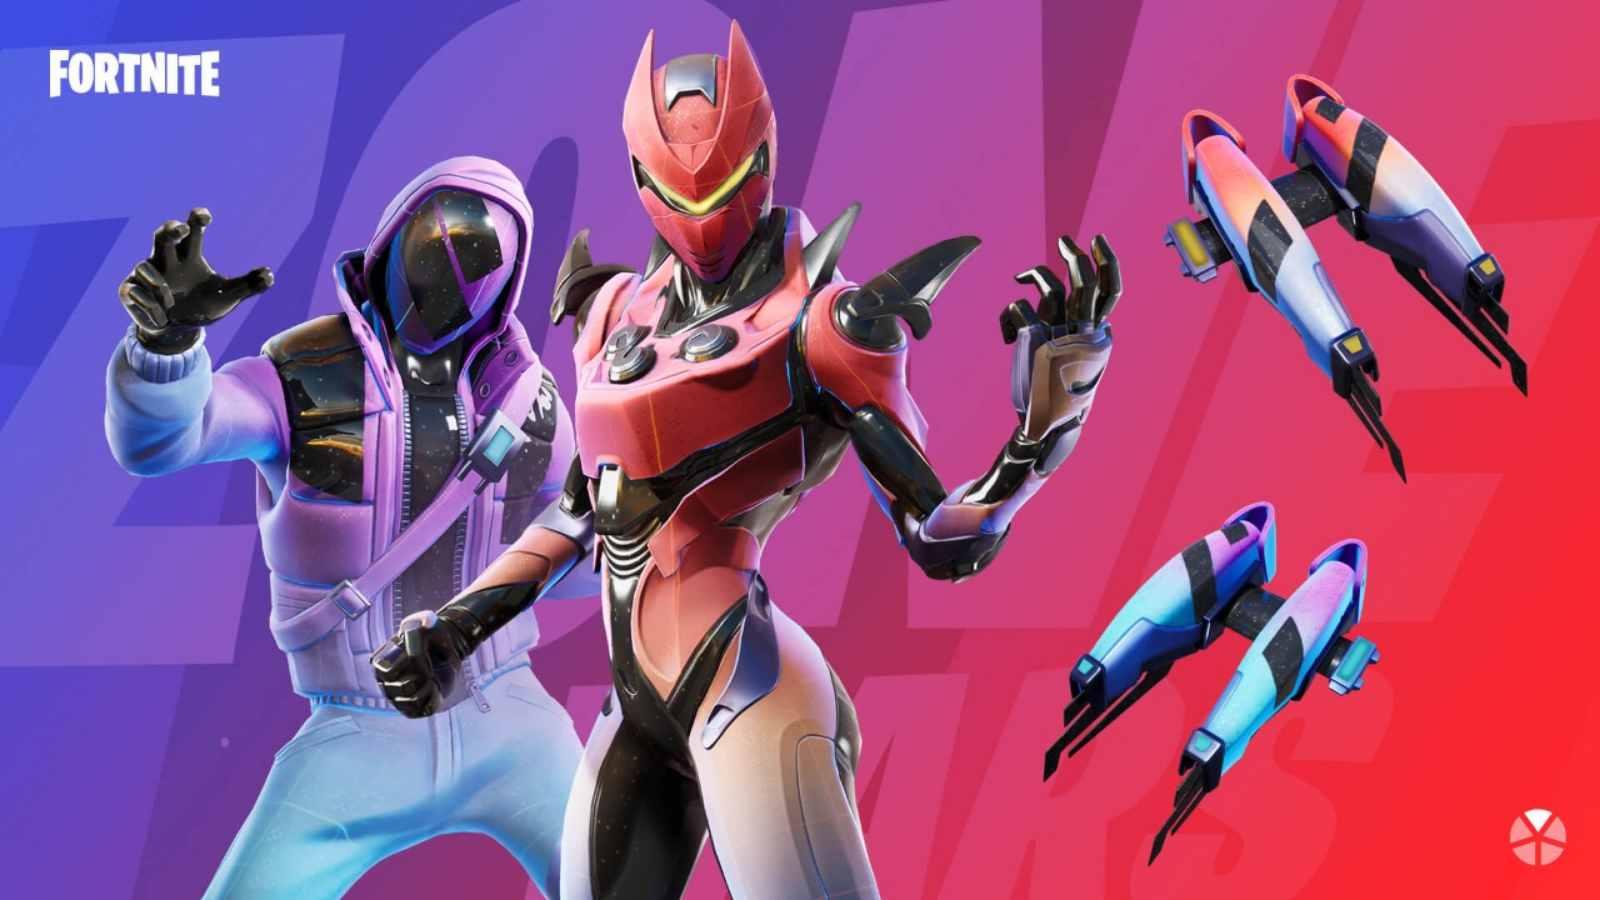 Fortnite Zone Wars: New Bundle, Challenges, And Rewards in Season 7